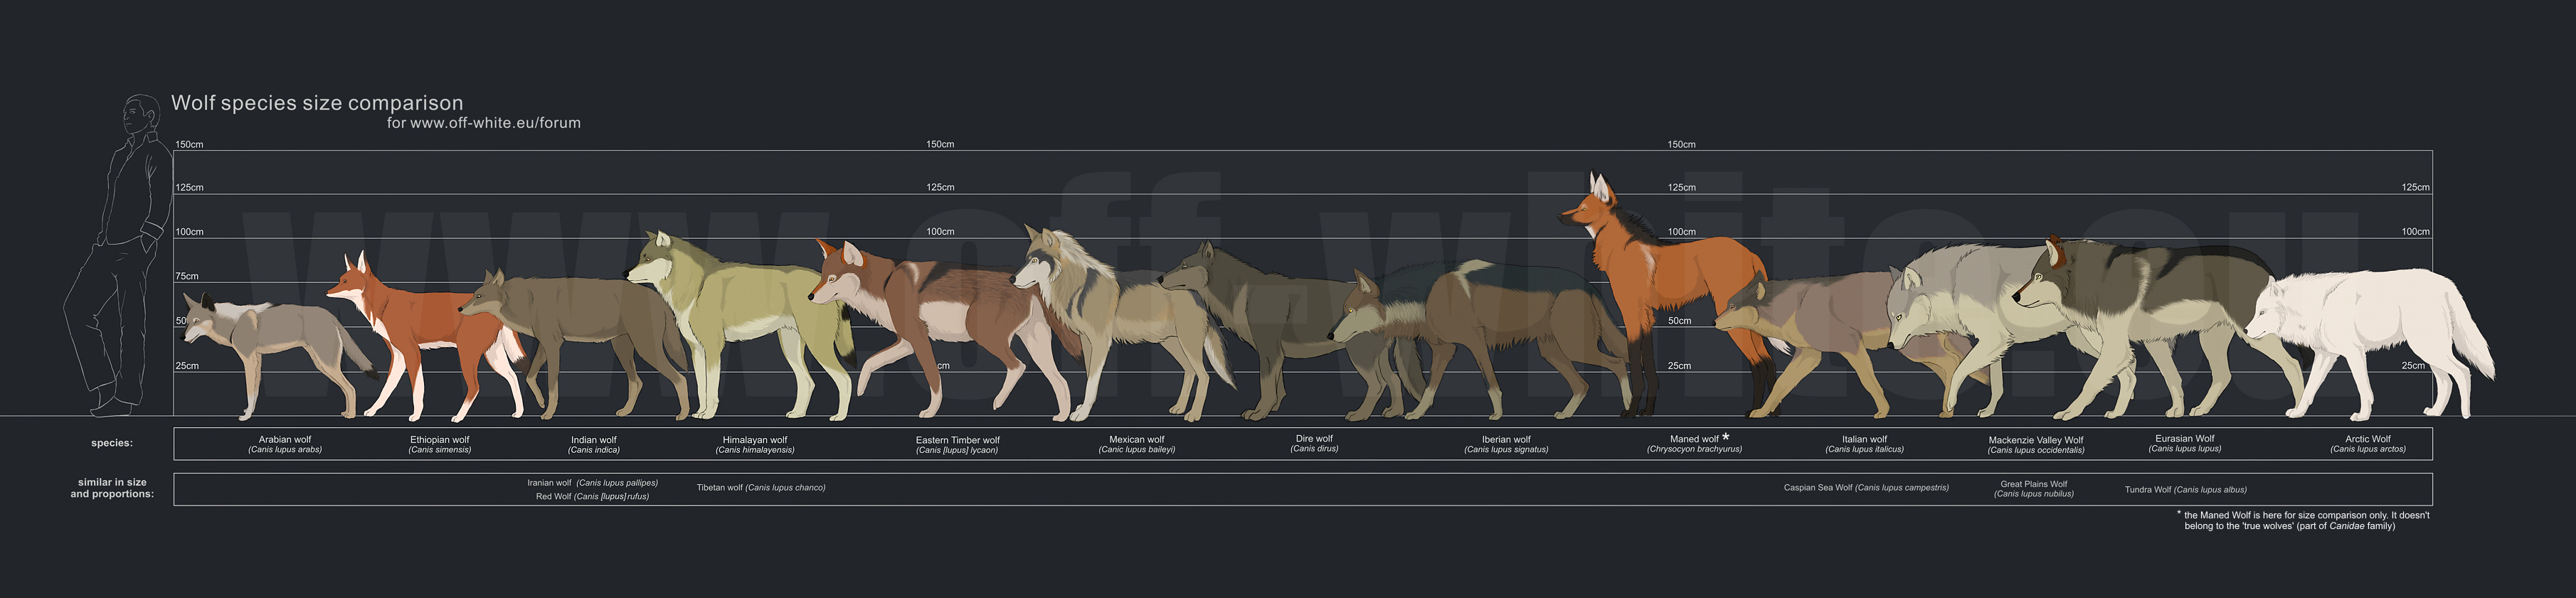 http://orig06.deviantart.net/20af/f/2009/151/4/7/wolf_species_size_comparison_by_tanathe.jpg